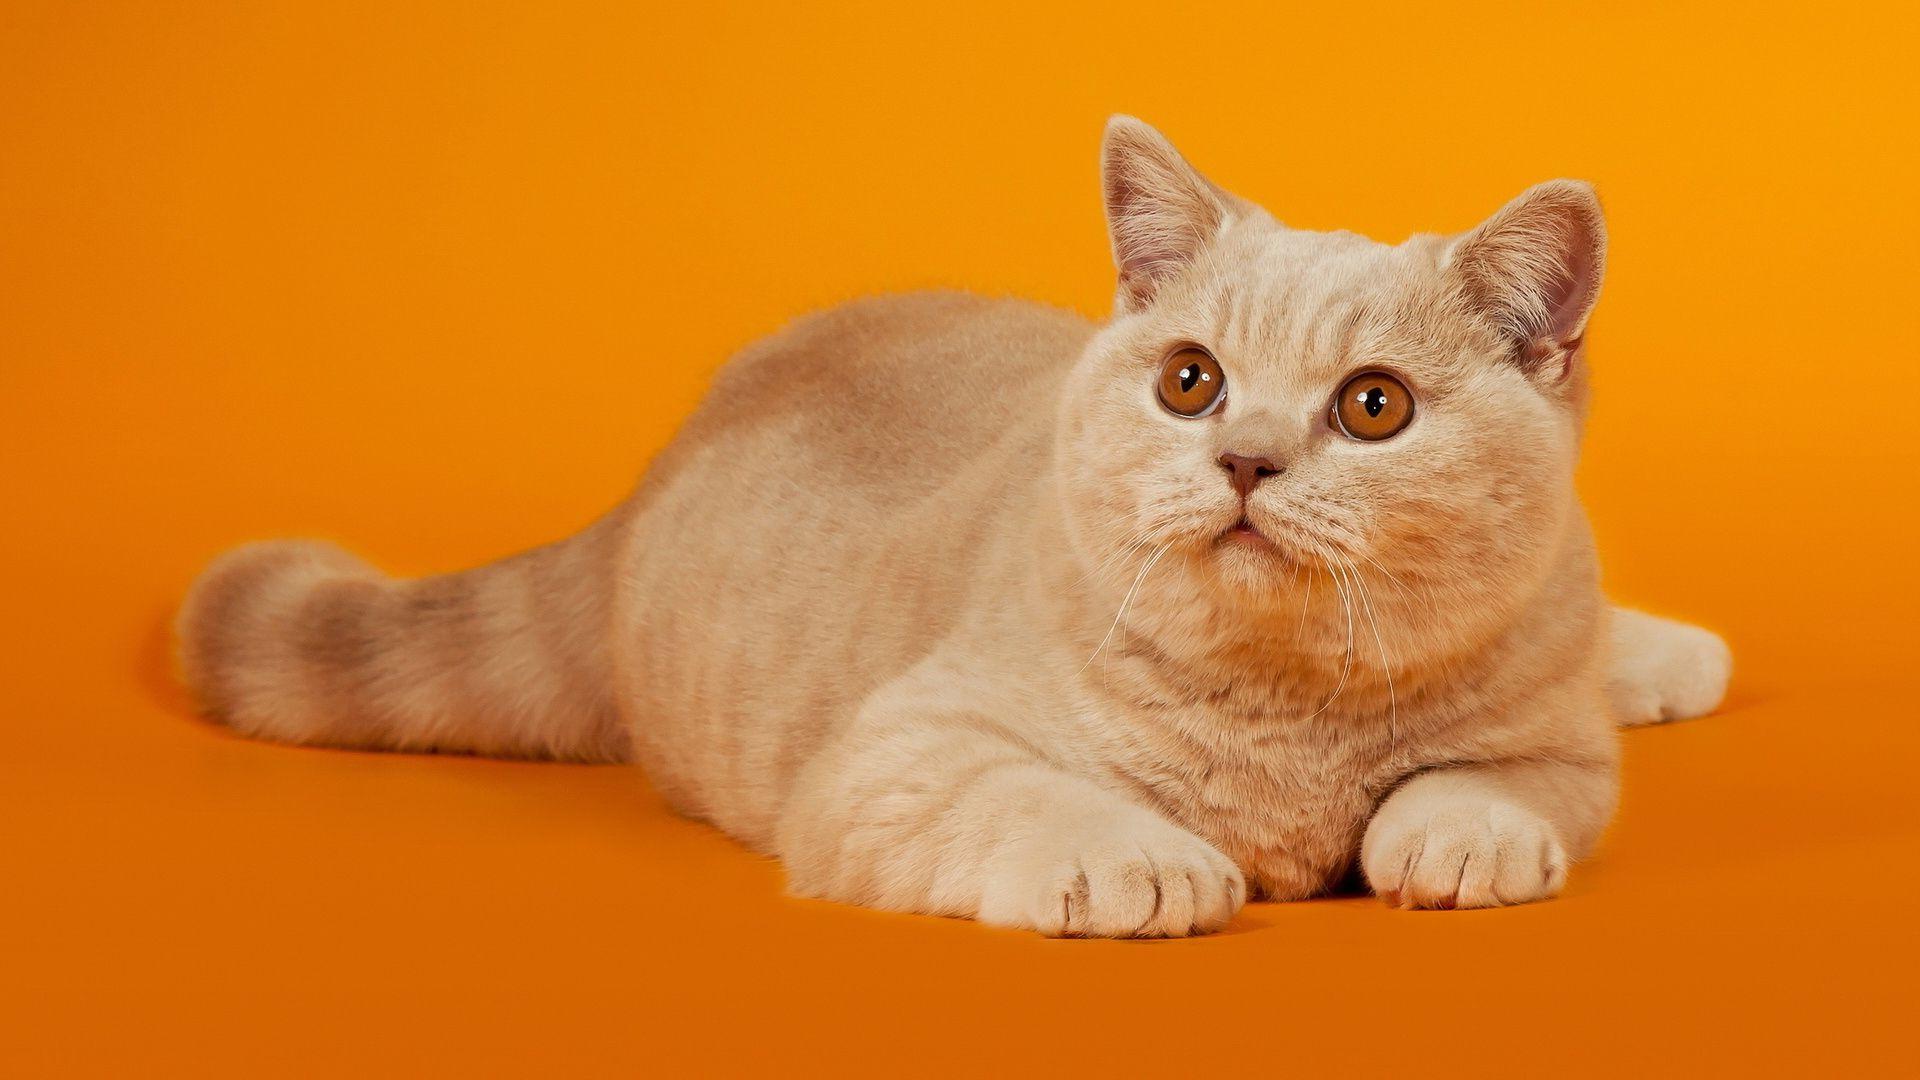 Cute Cats Desktop Wallpaper Pinterest Funny Animal Animal